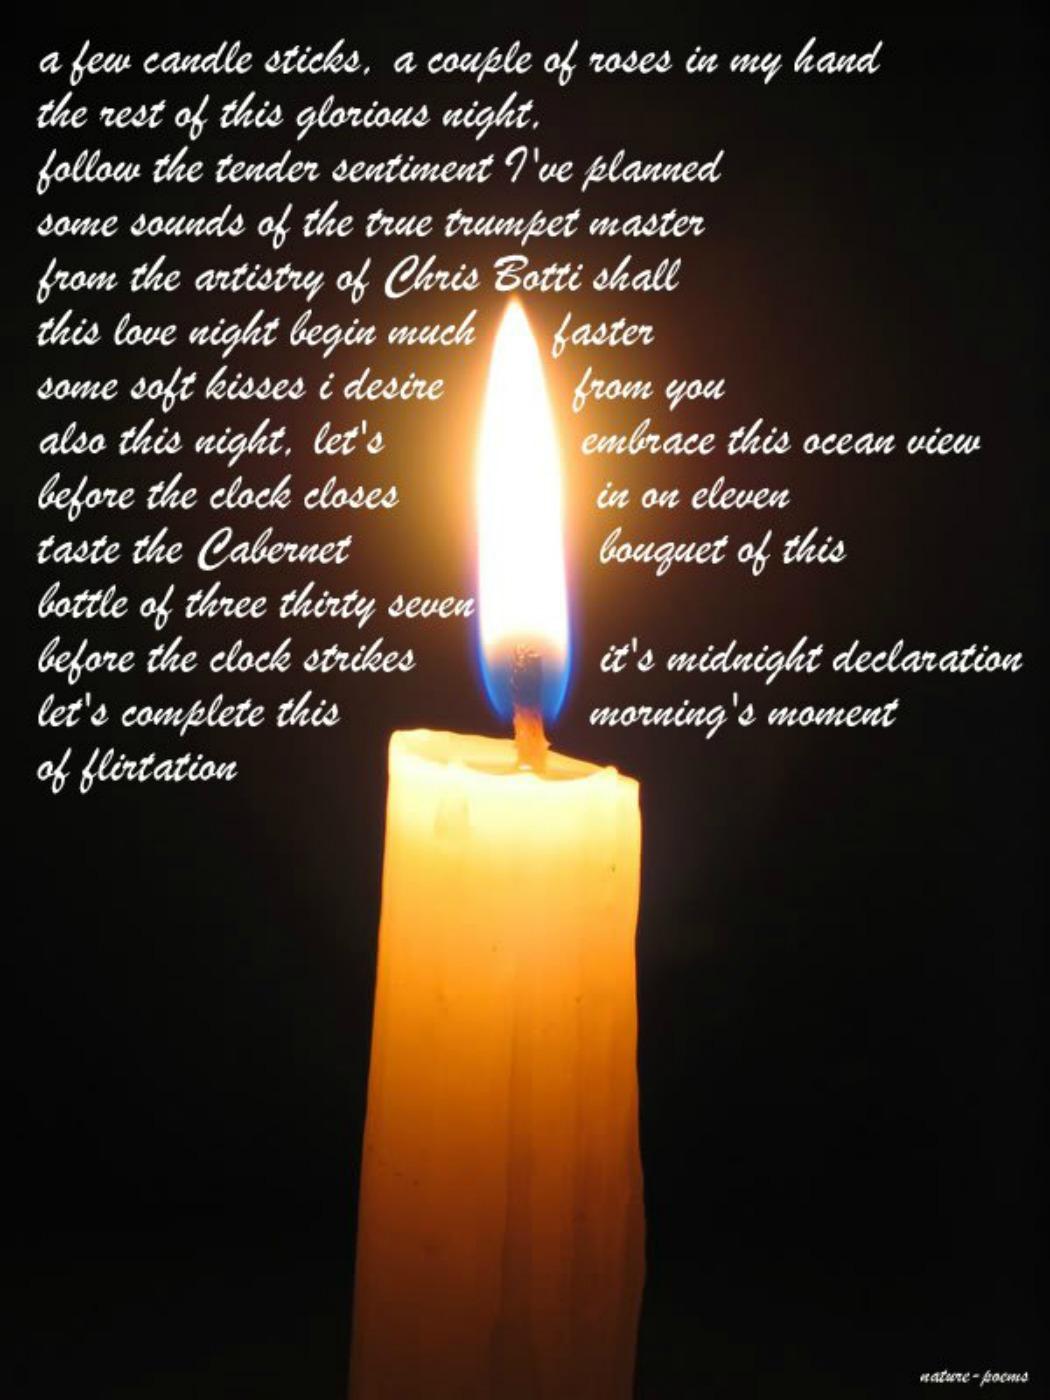 Candle Sticks Picturesque Poem